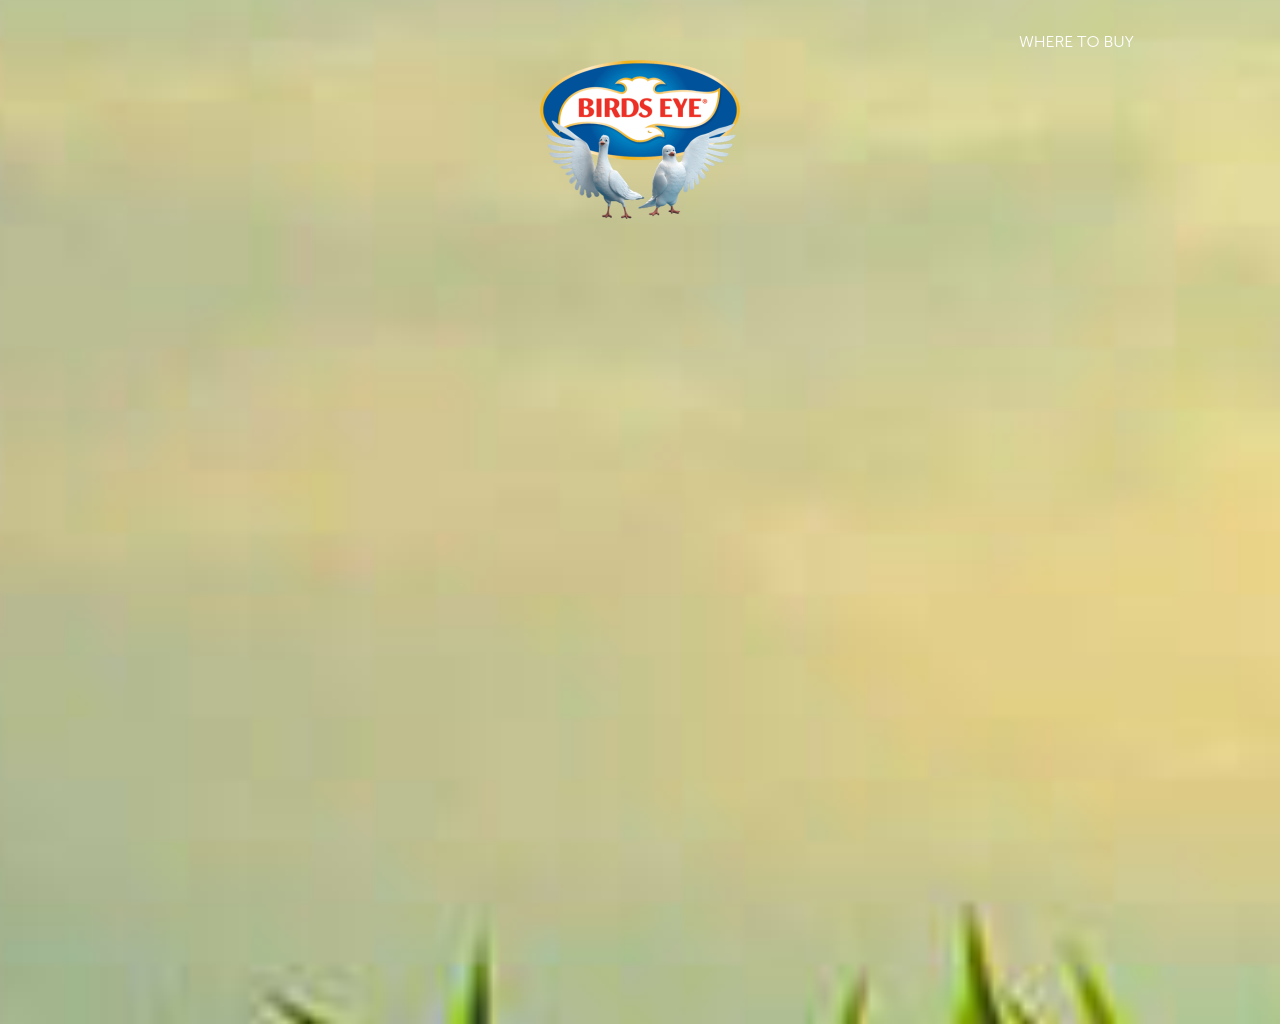 Birds-Eye-Advertising-Reviews-Pricing